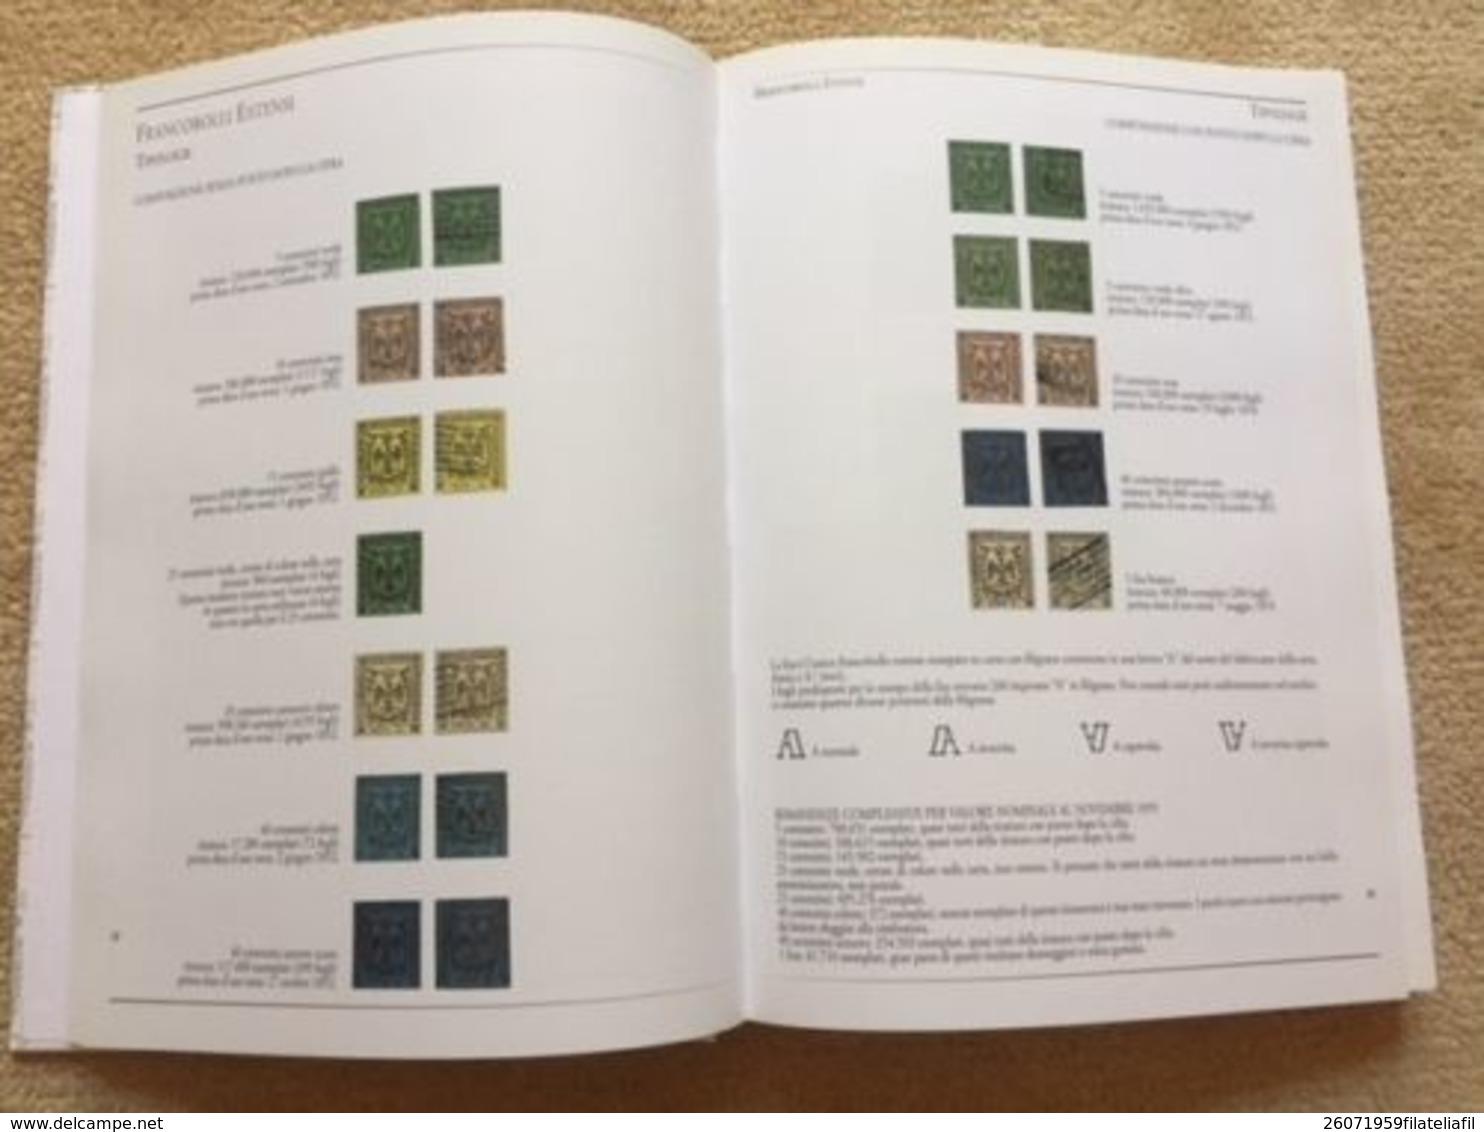 BIBLIOTECA FILATELICA: 150° ANNIVERSARIO DEI FRANCOBOLLI ESTENSI - Filatelia E Storia Postale